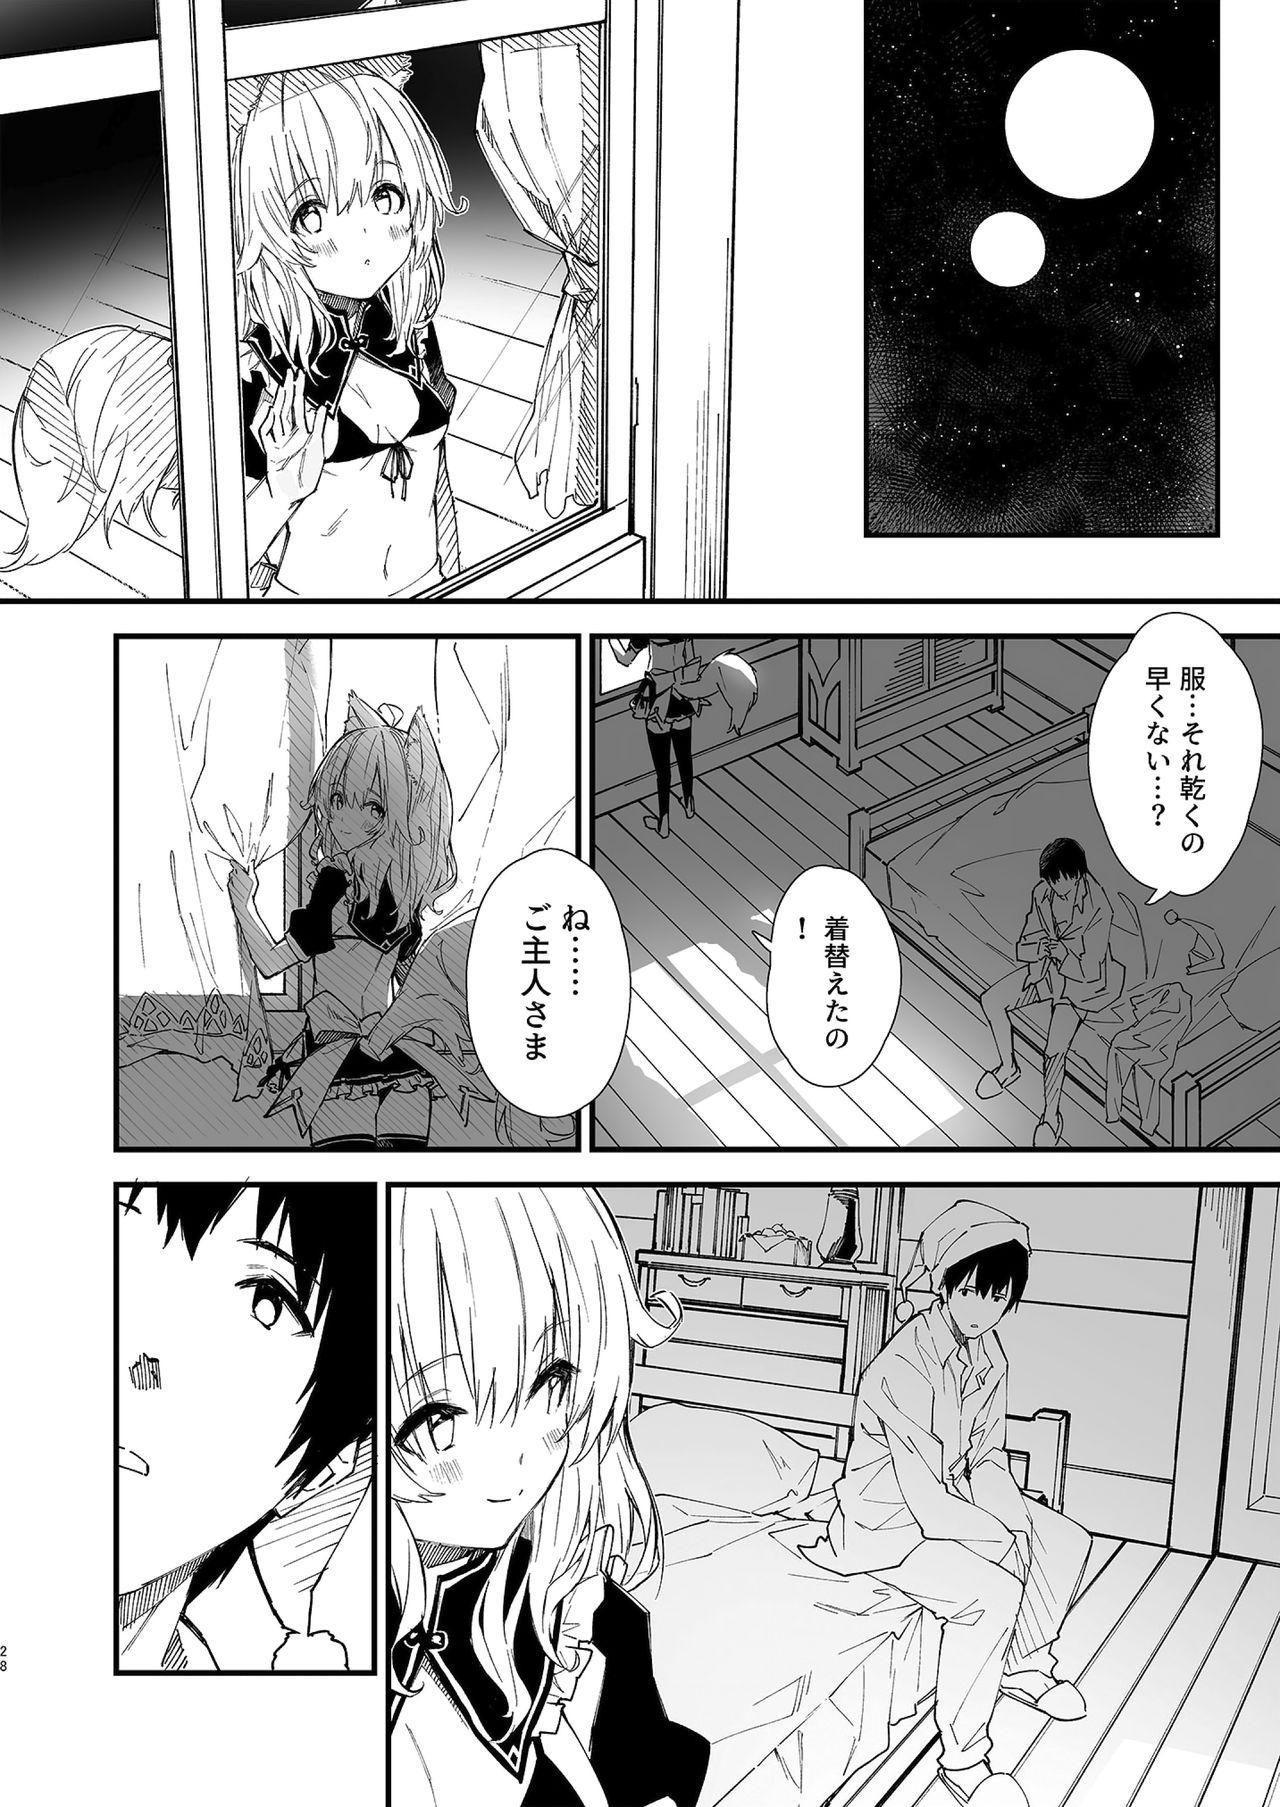 Kemomimi Maid to Ichaicha suru Hon 25